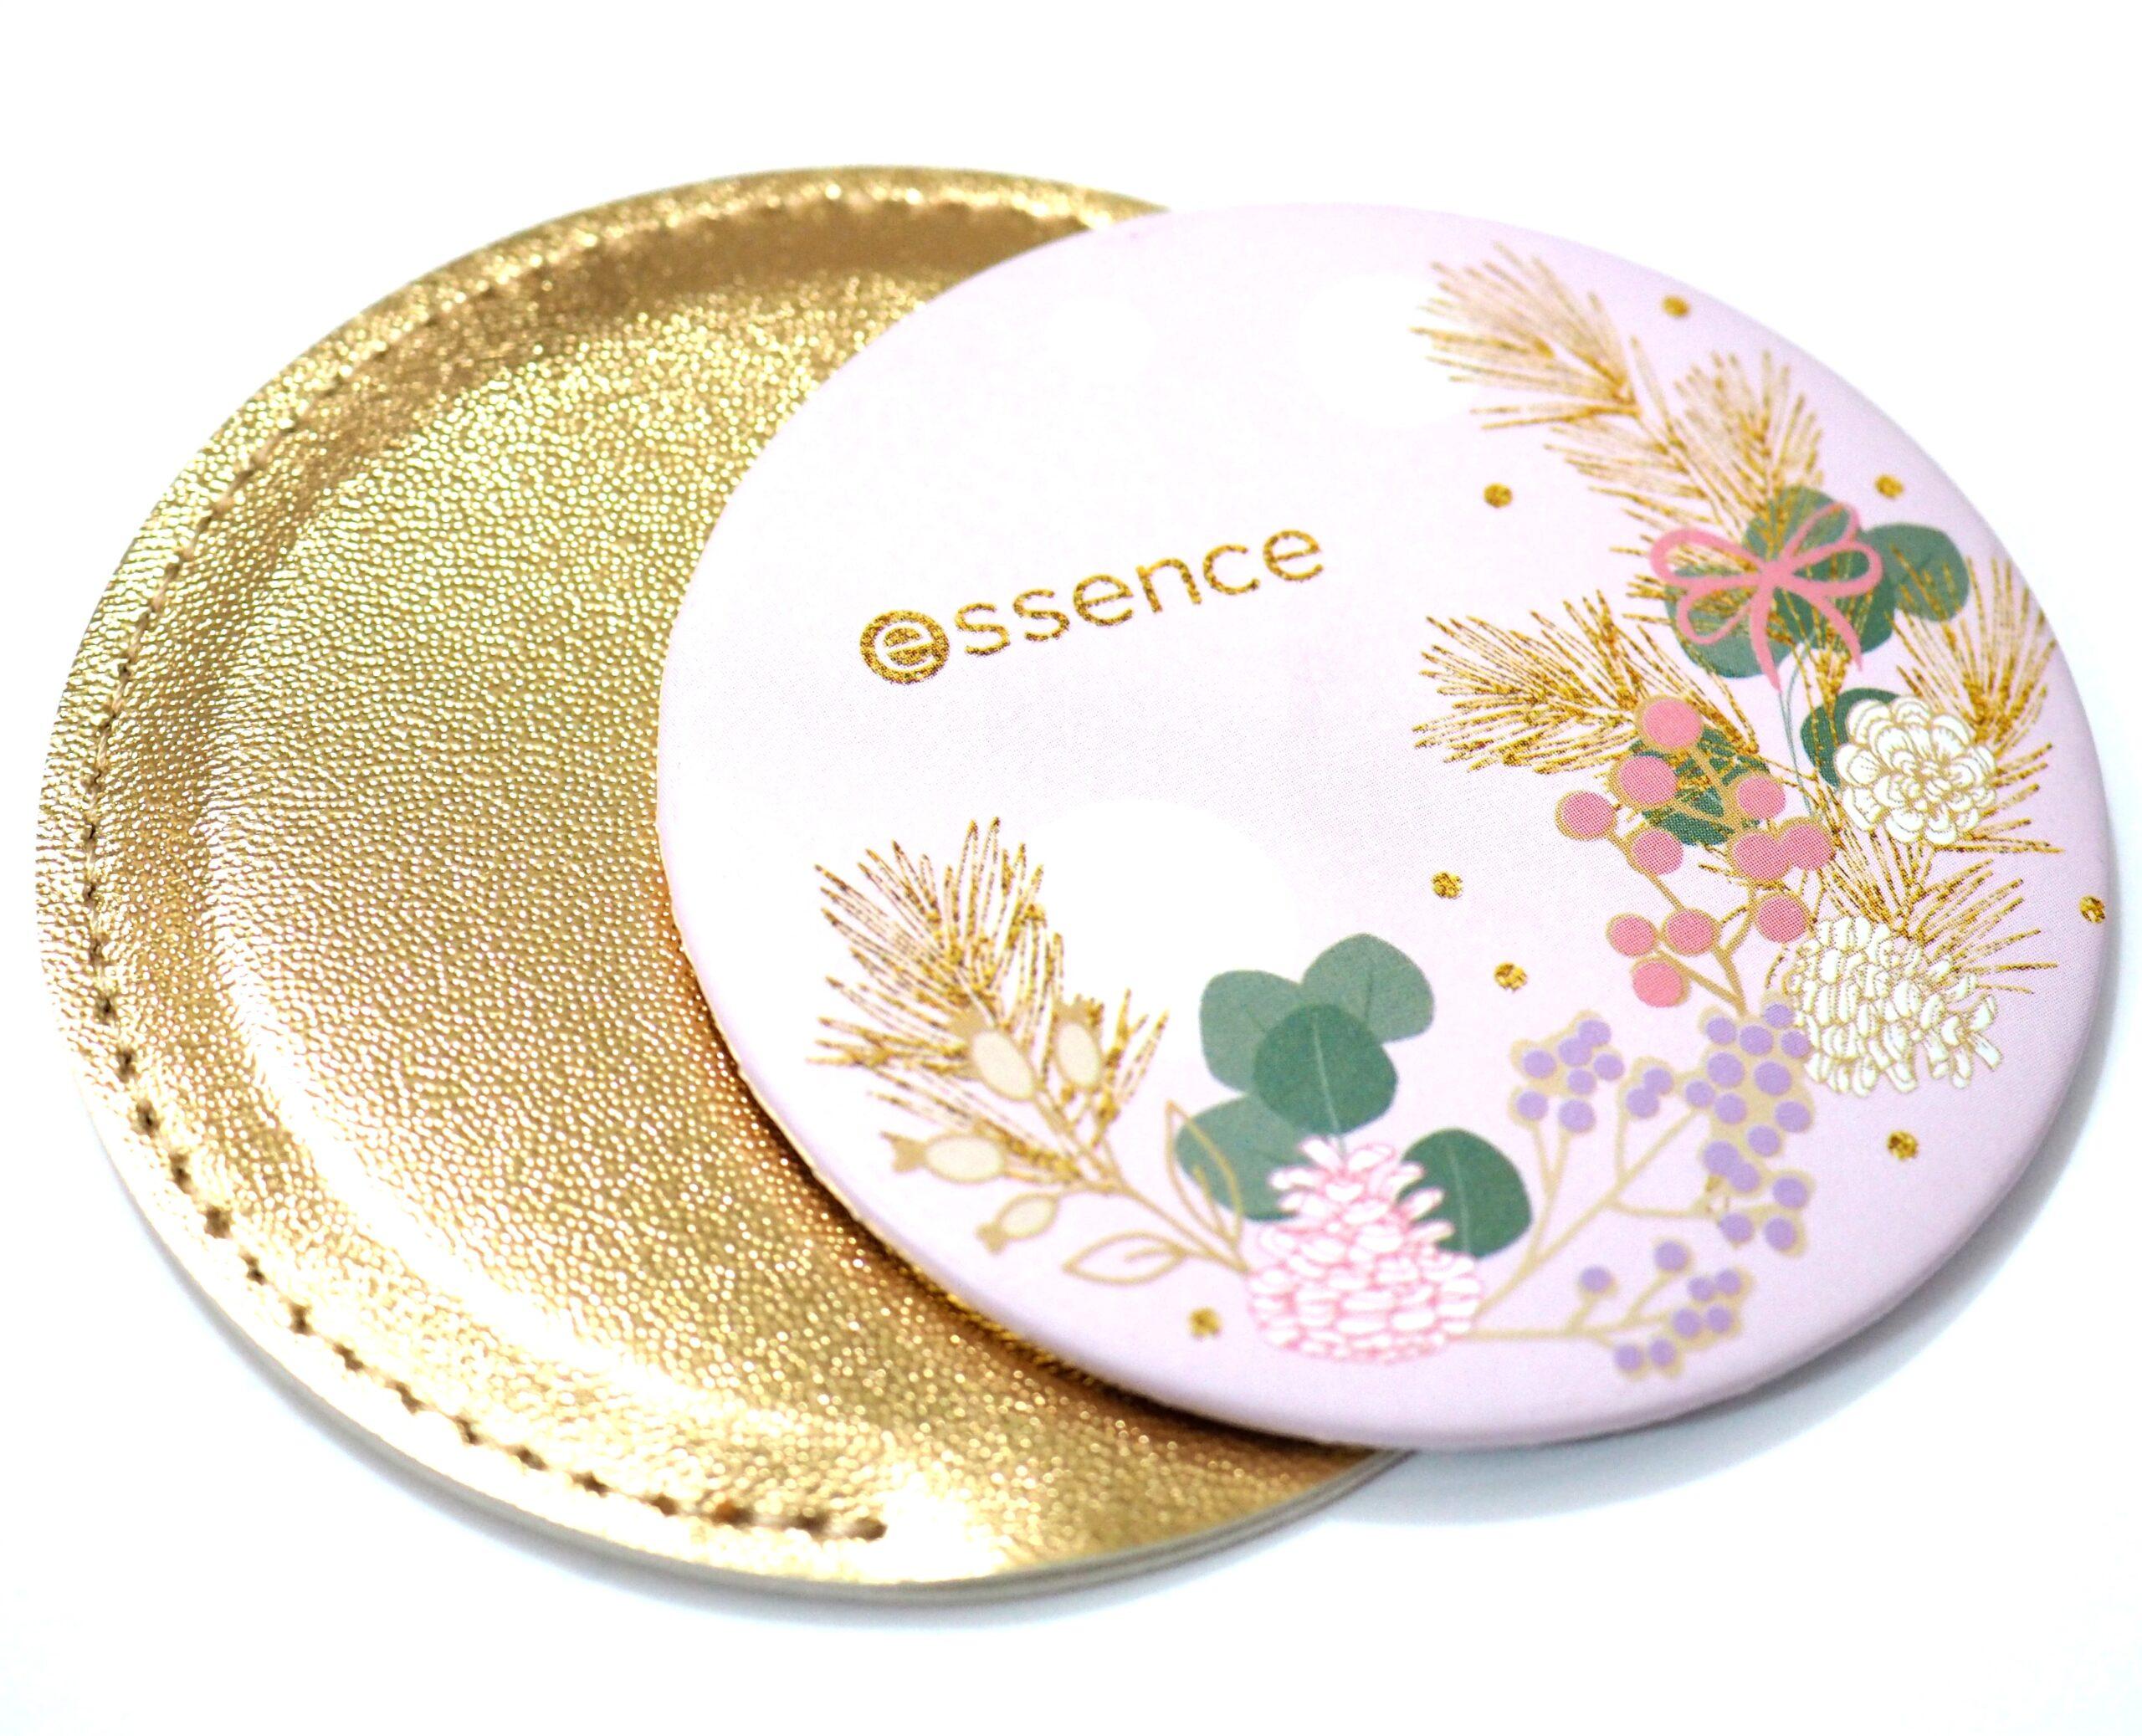 Essence 24 Sparkling Moments of Joy Advent Calendar 2021